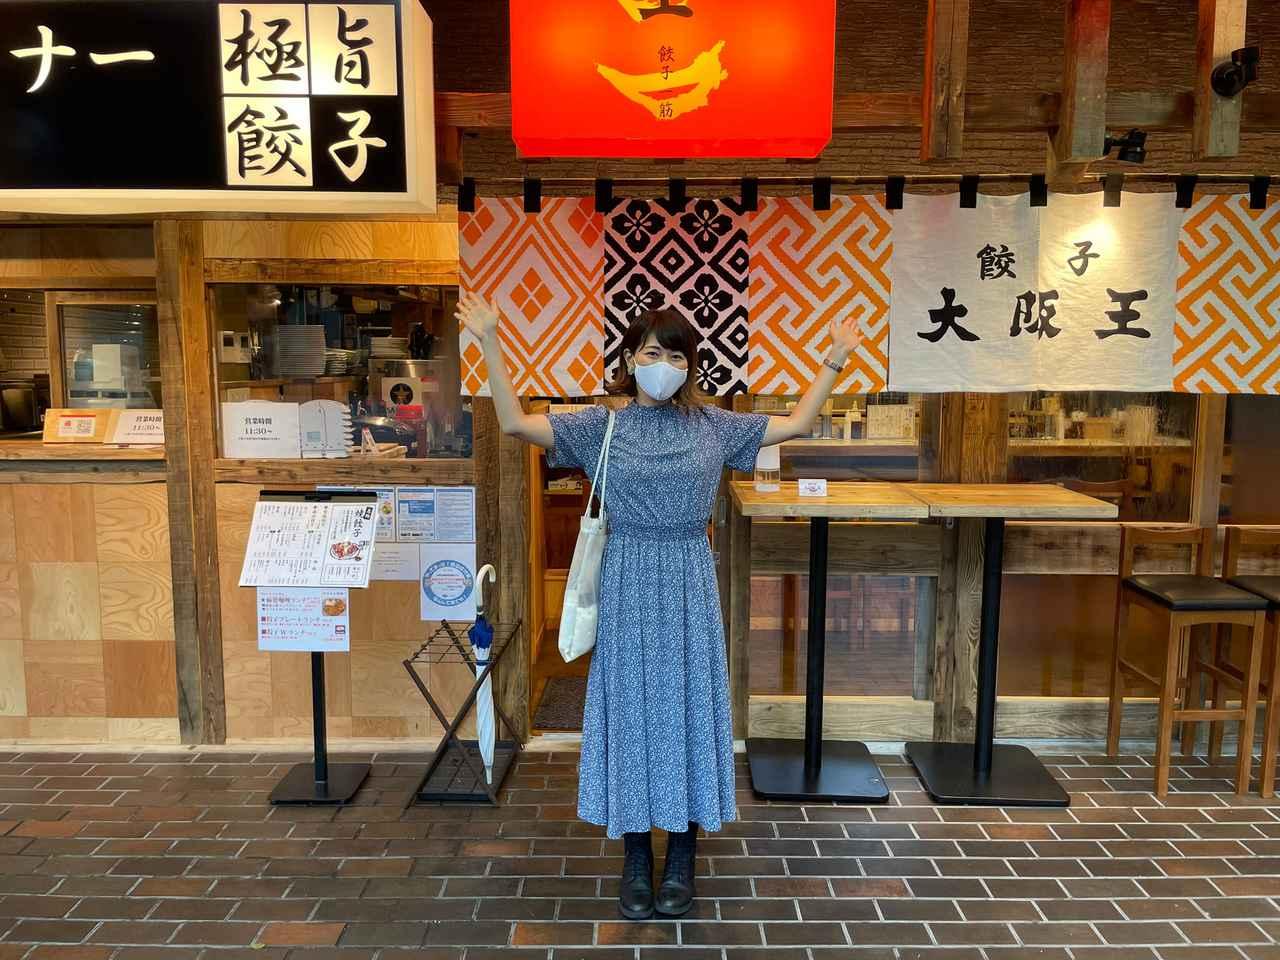 画像1: 7月23日:「大阪王 presents 彩名が行く!餃子世界化計画」